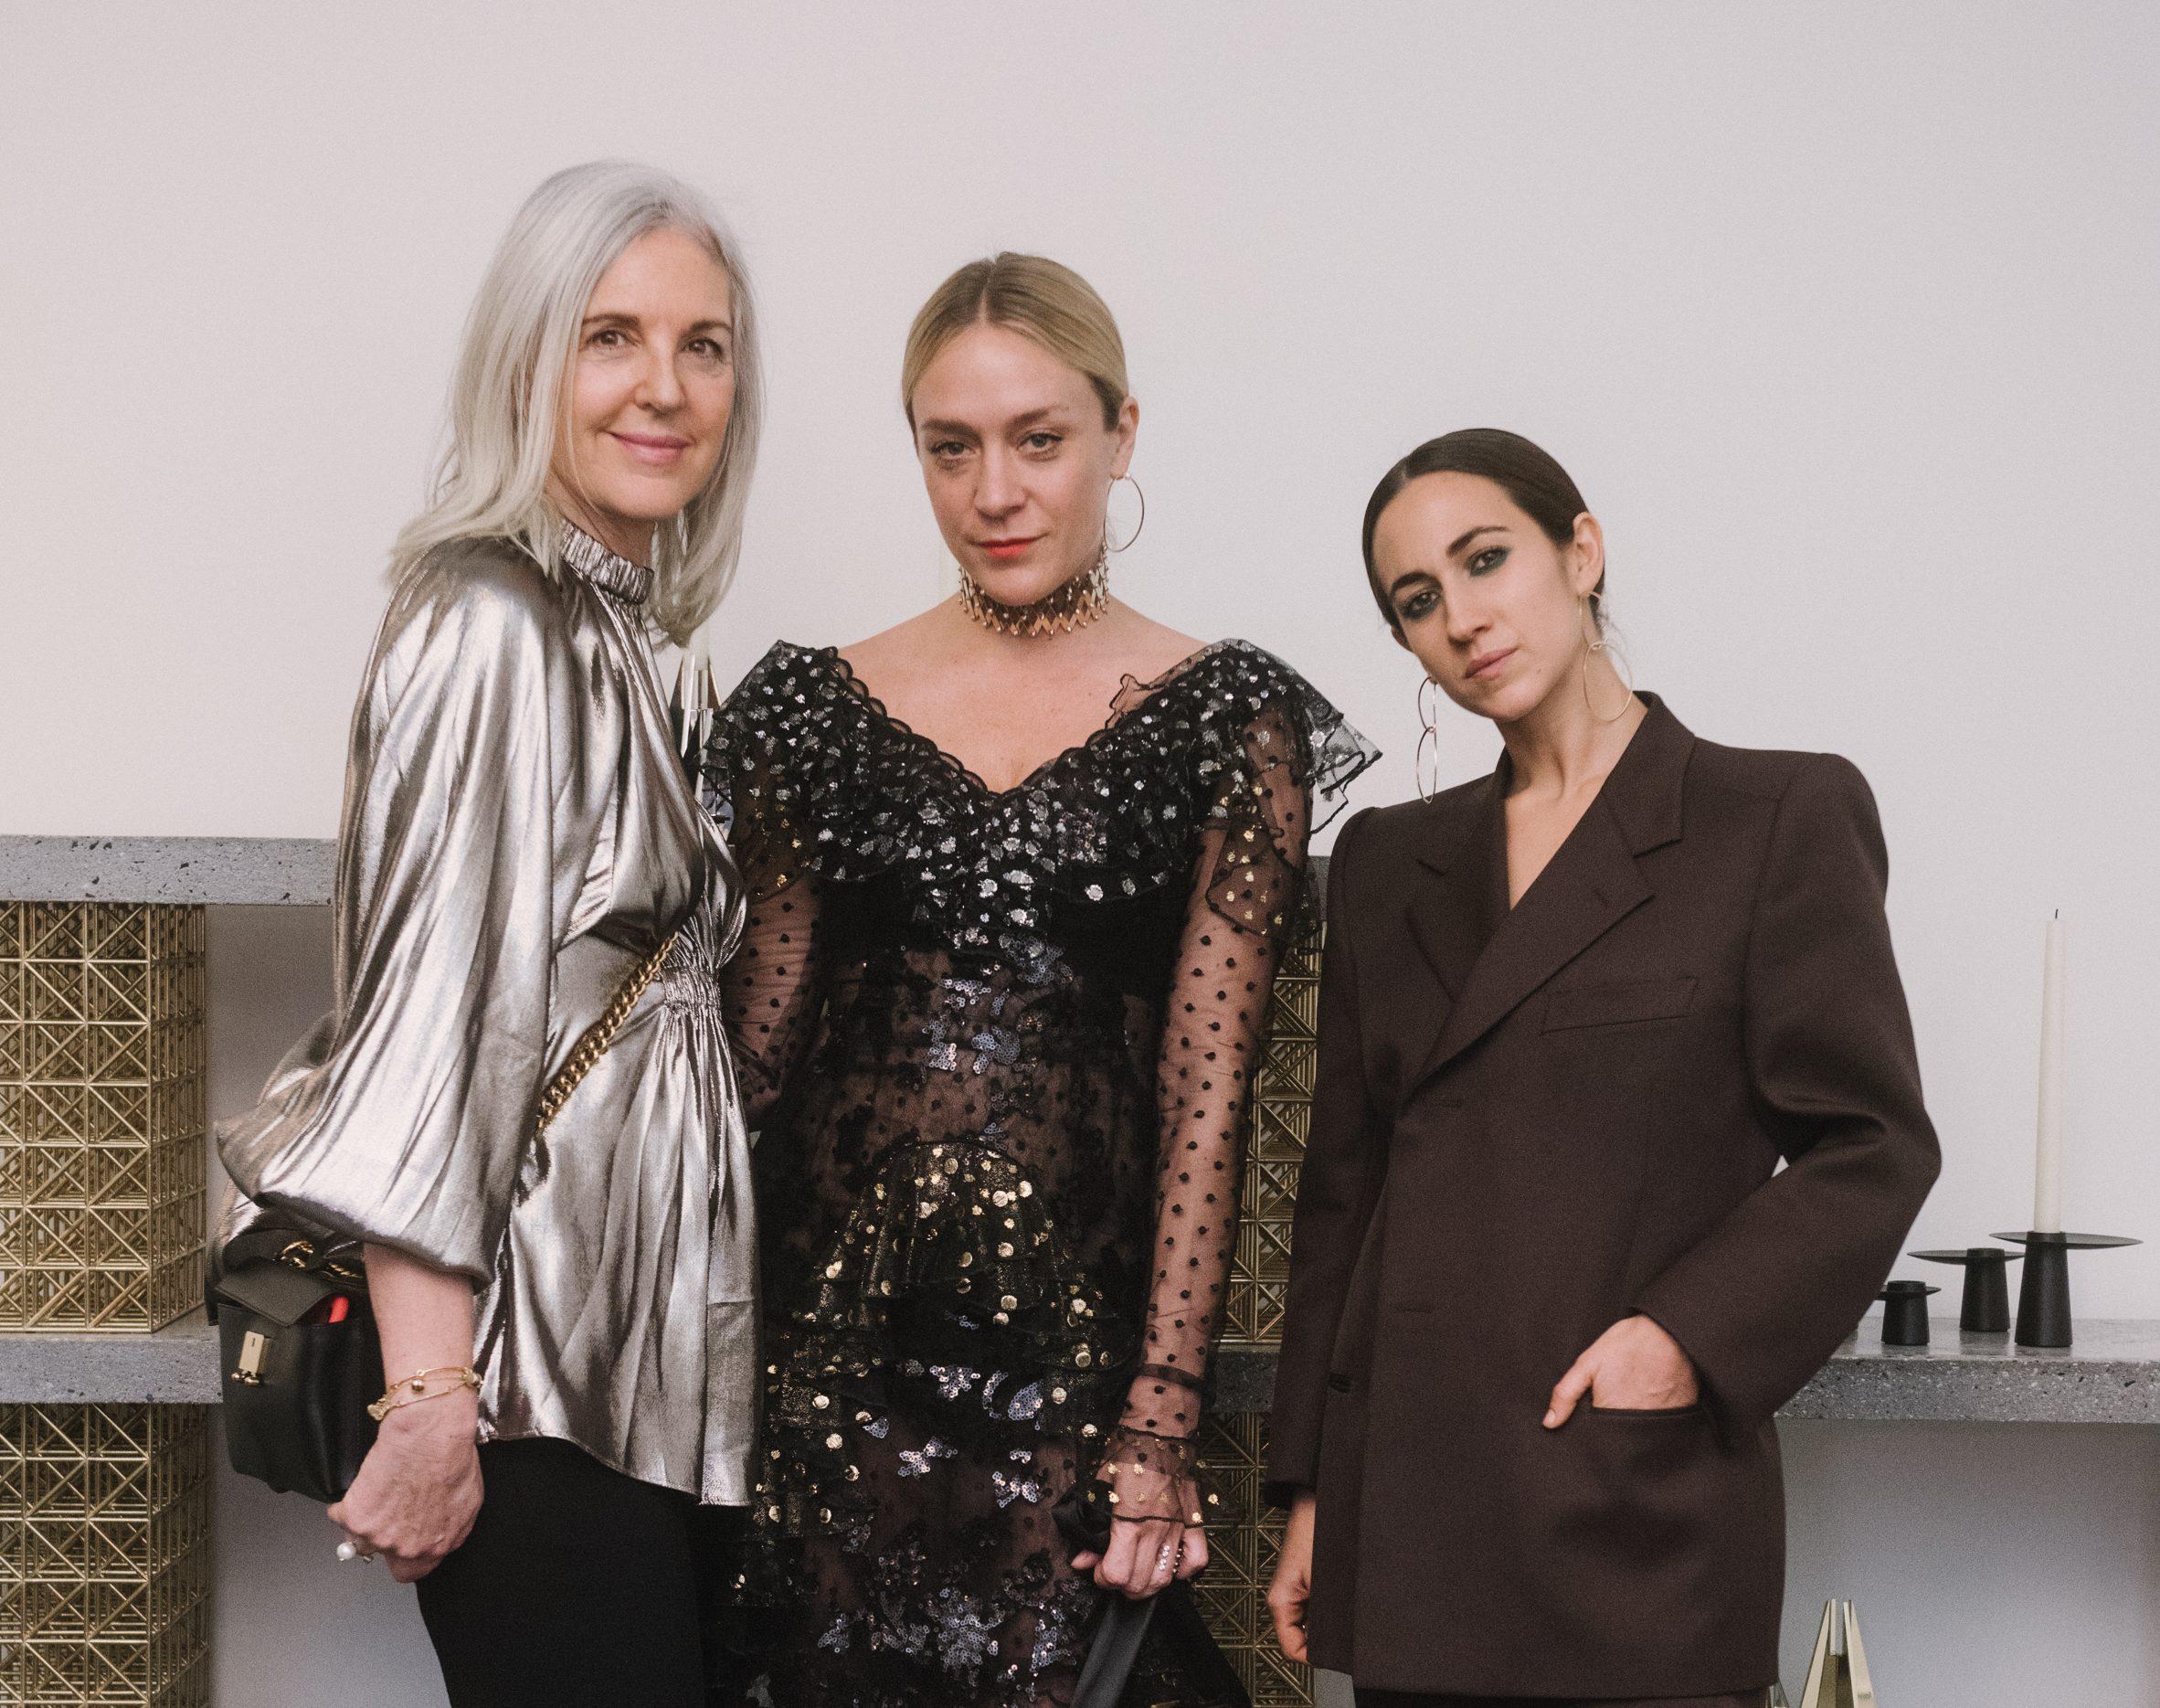 Ruth Chapman, Chloë Sevigny and Delfina Delettrez.